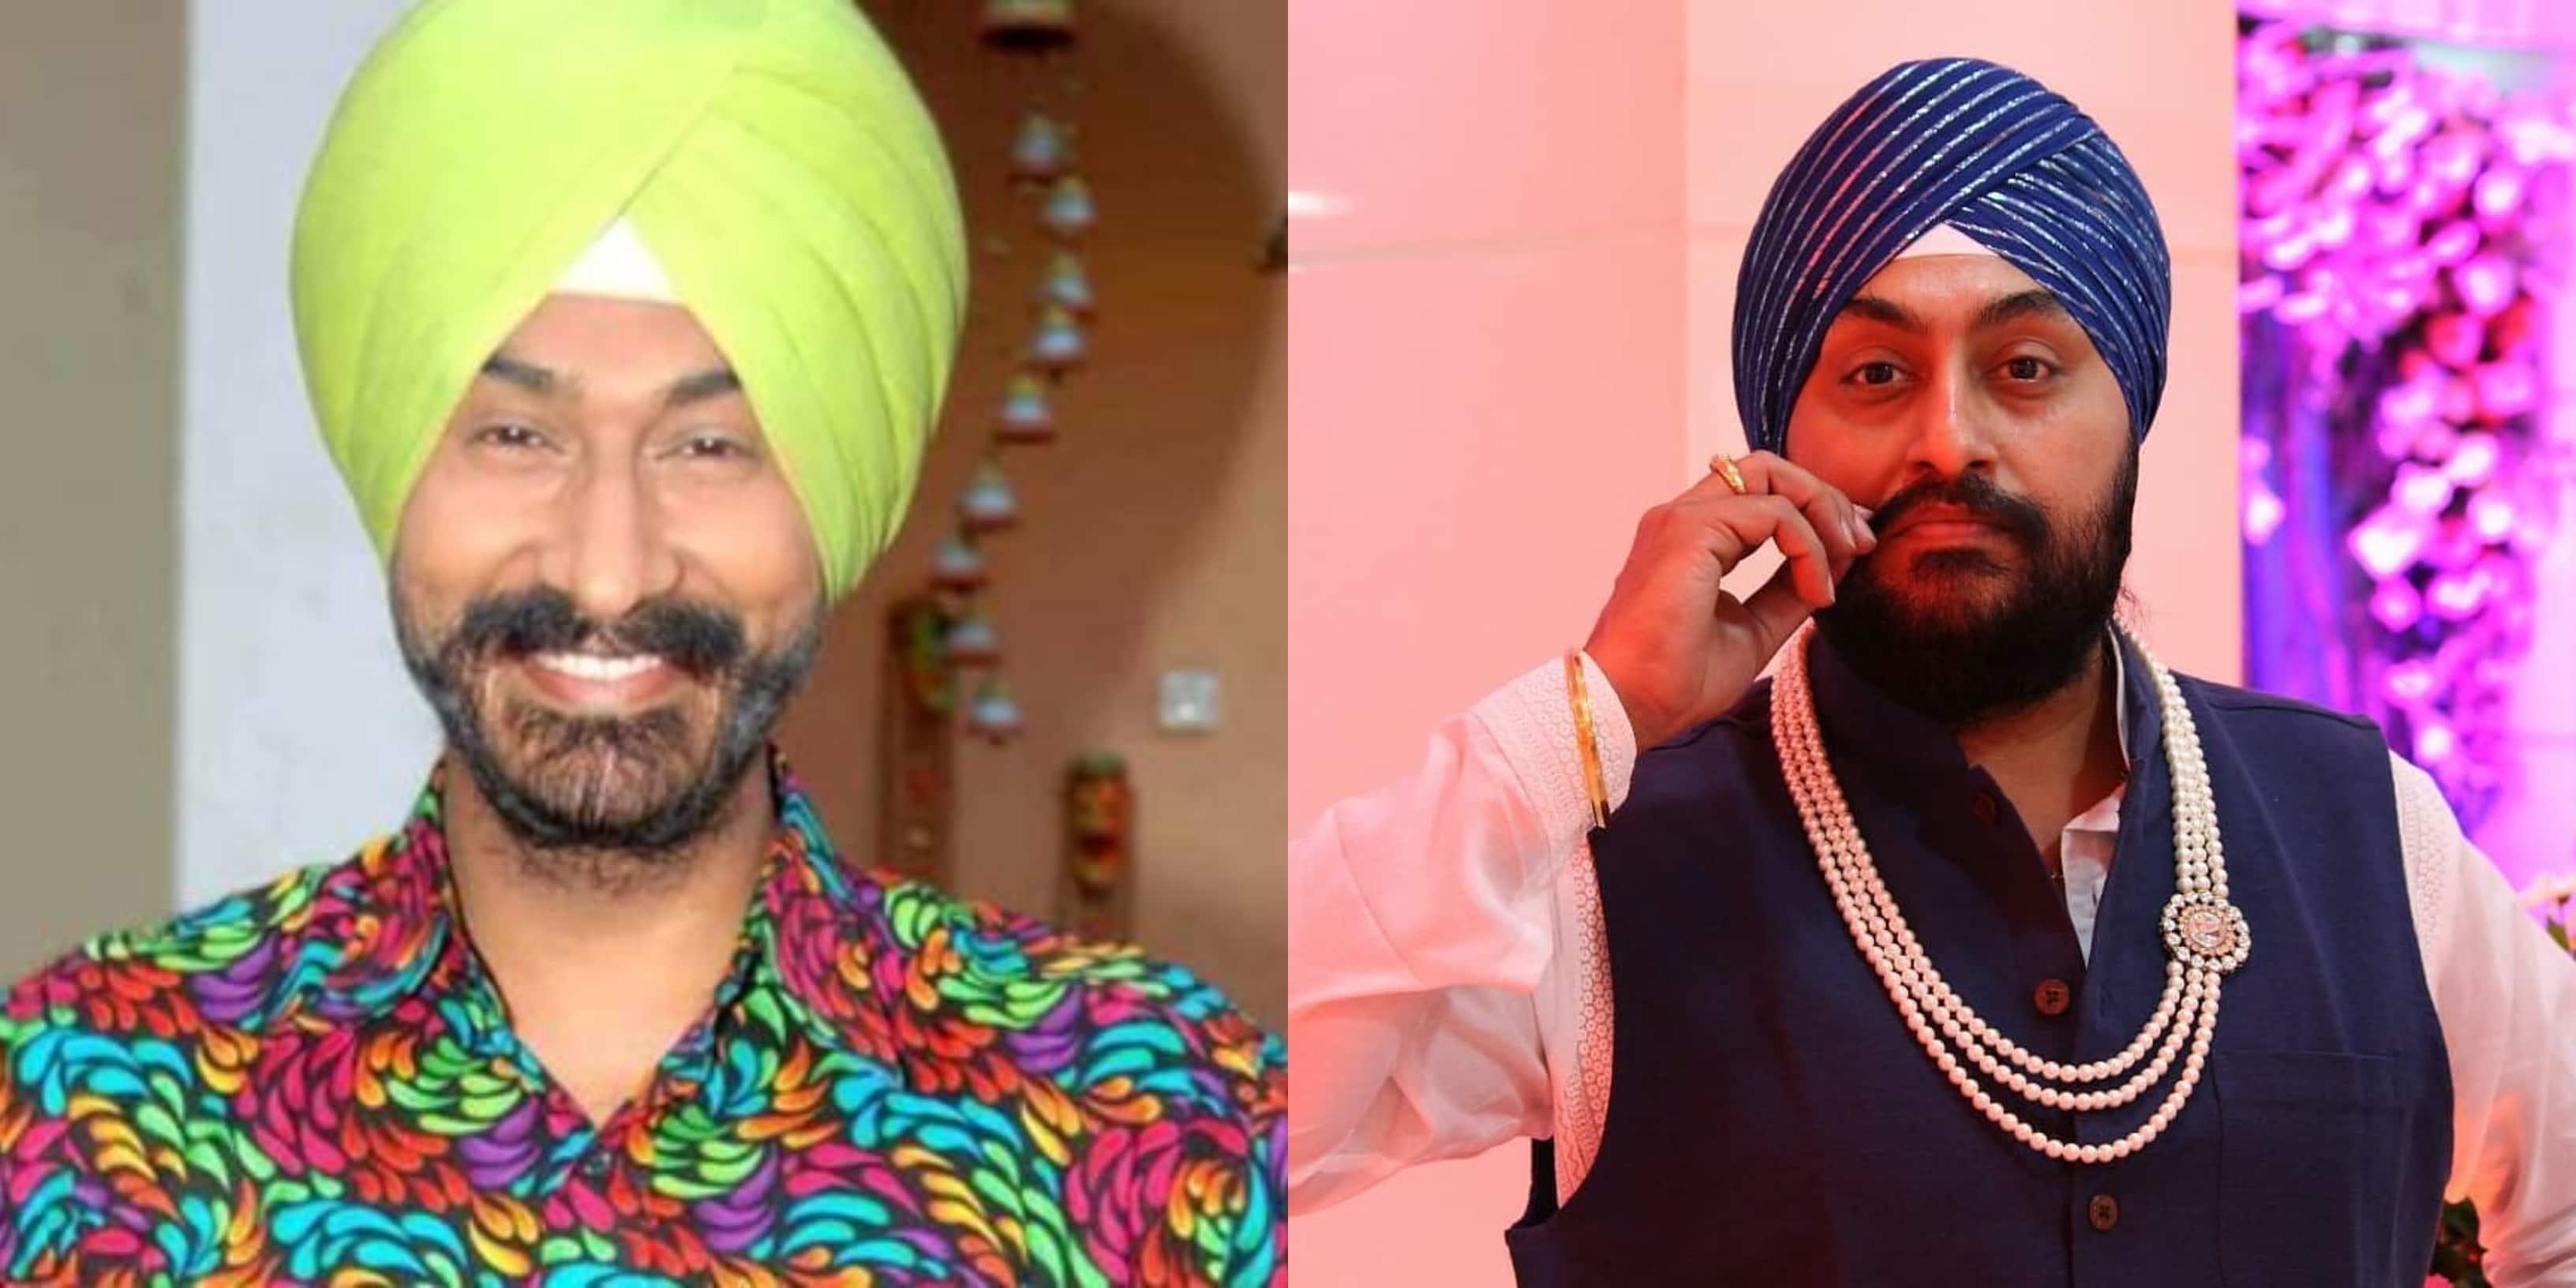 Taarak Mehta Ka Ooltah Chashmah: Balvinder Singh, Sunayana Fozdar Are Honored To Be A Part Of The Show